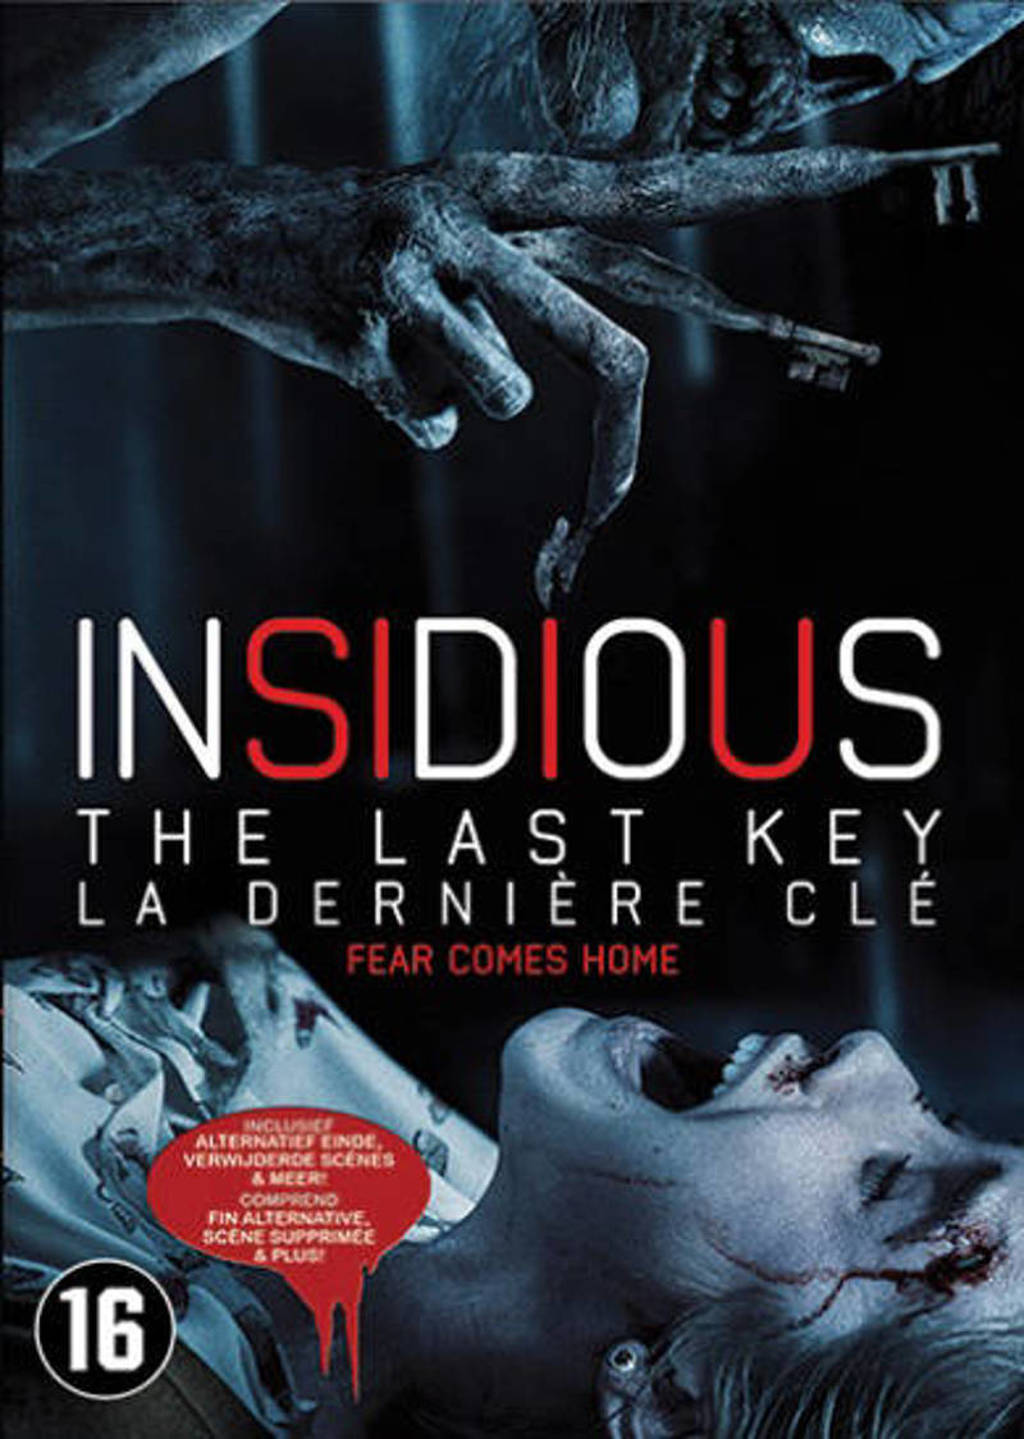 Insidious - The last key (DVD)